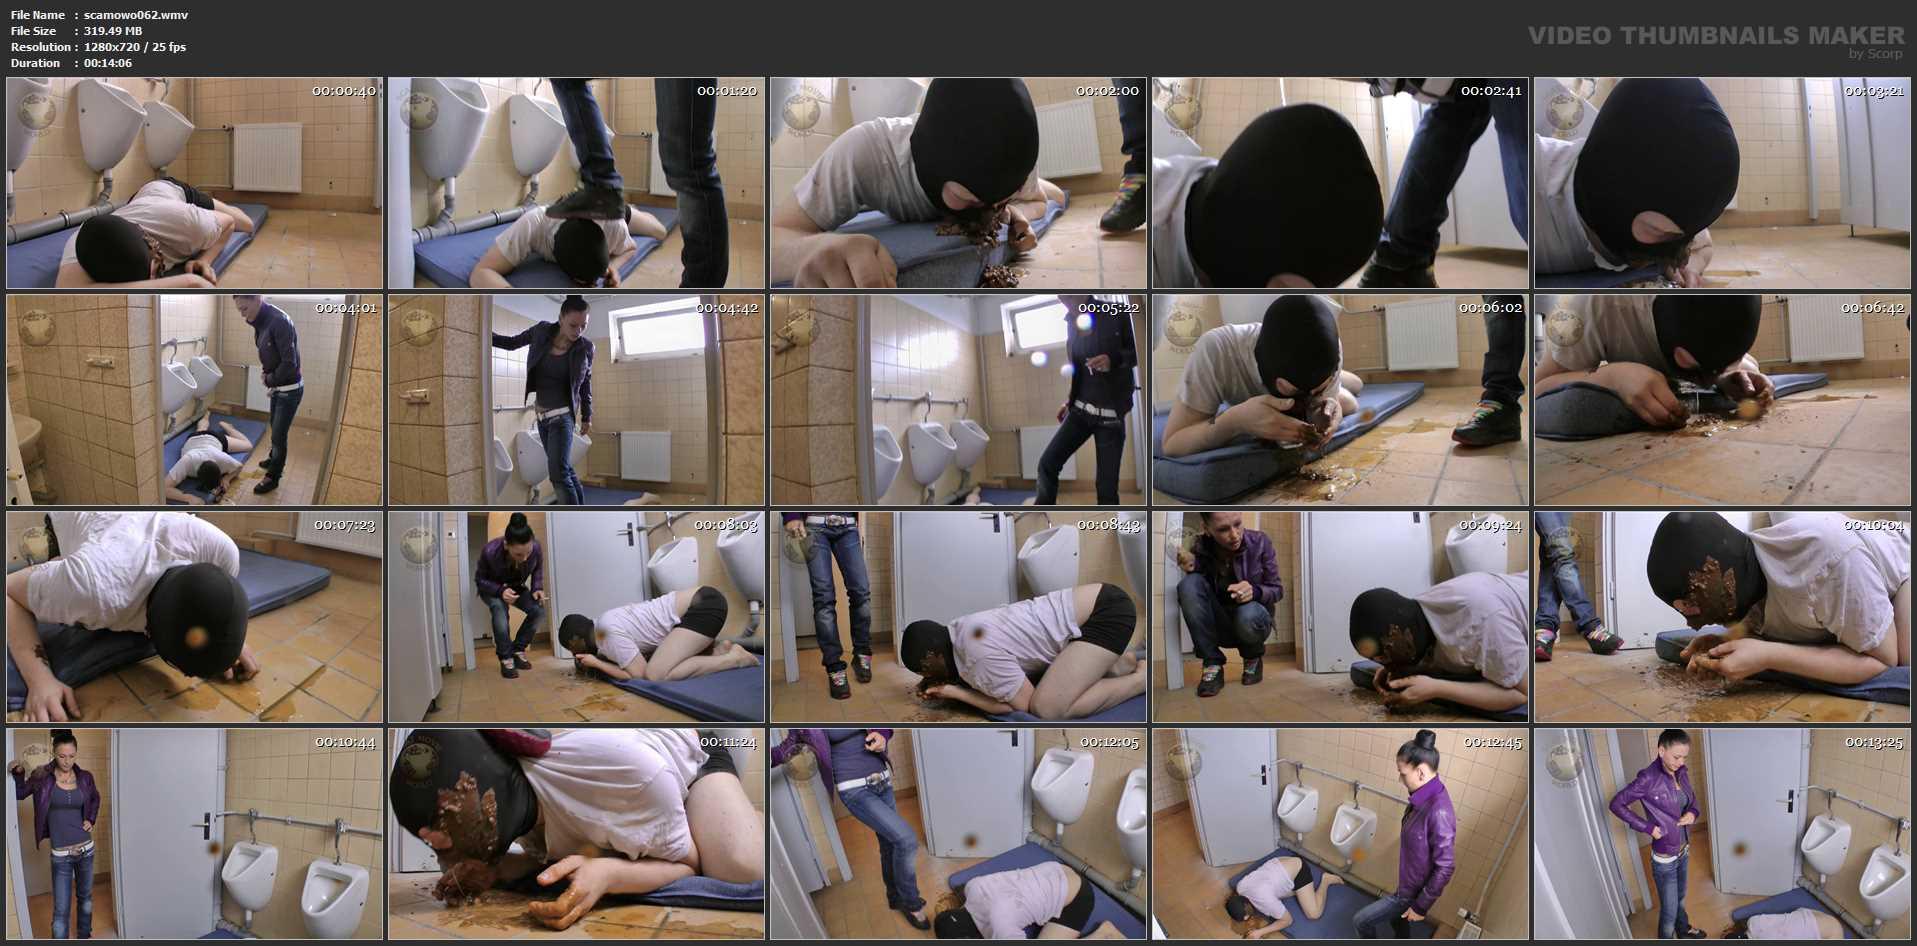 [SCAT-MOVIE-WORLD / CAVIAR-FEMDOM-GIRLS] Homeless help made by Lady Chantal [HD][720p][WMV]